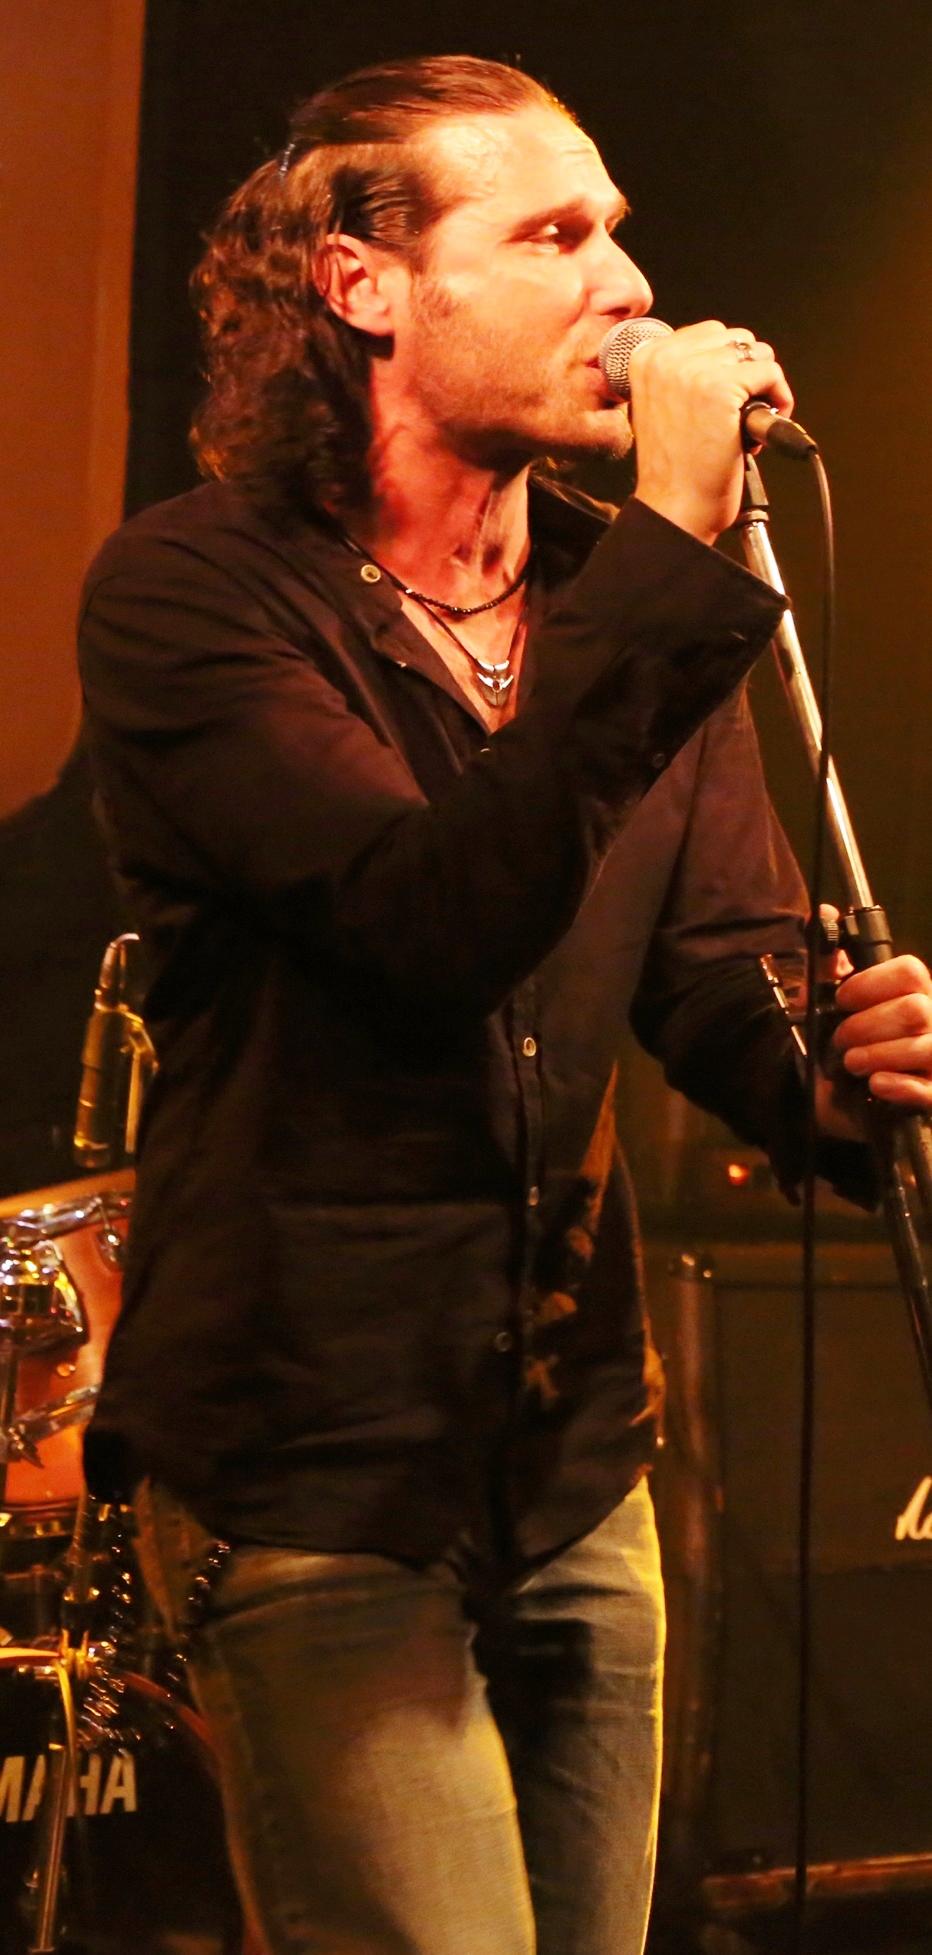 ao-live_mit_band-shibuya3.jpg